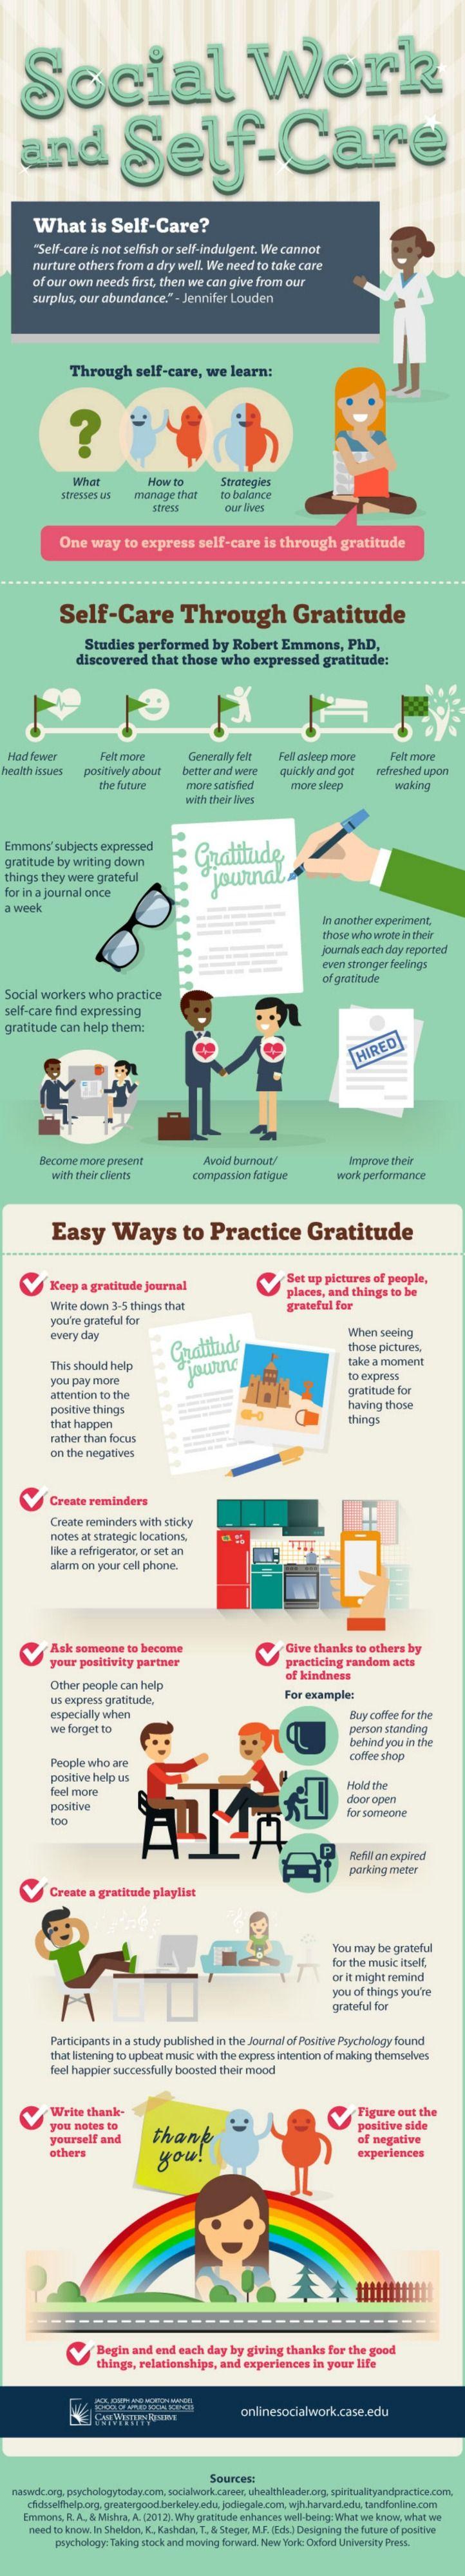 Infographic: Self-Care Through Gratitude http://www.yoganonymous.com/infographic-self-care-through-gratitude via @yoganonymous